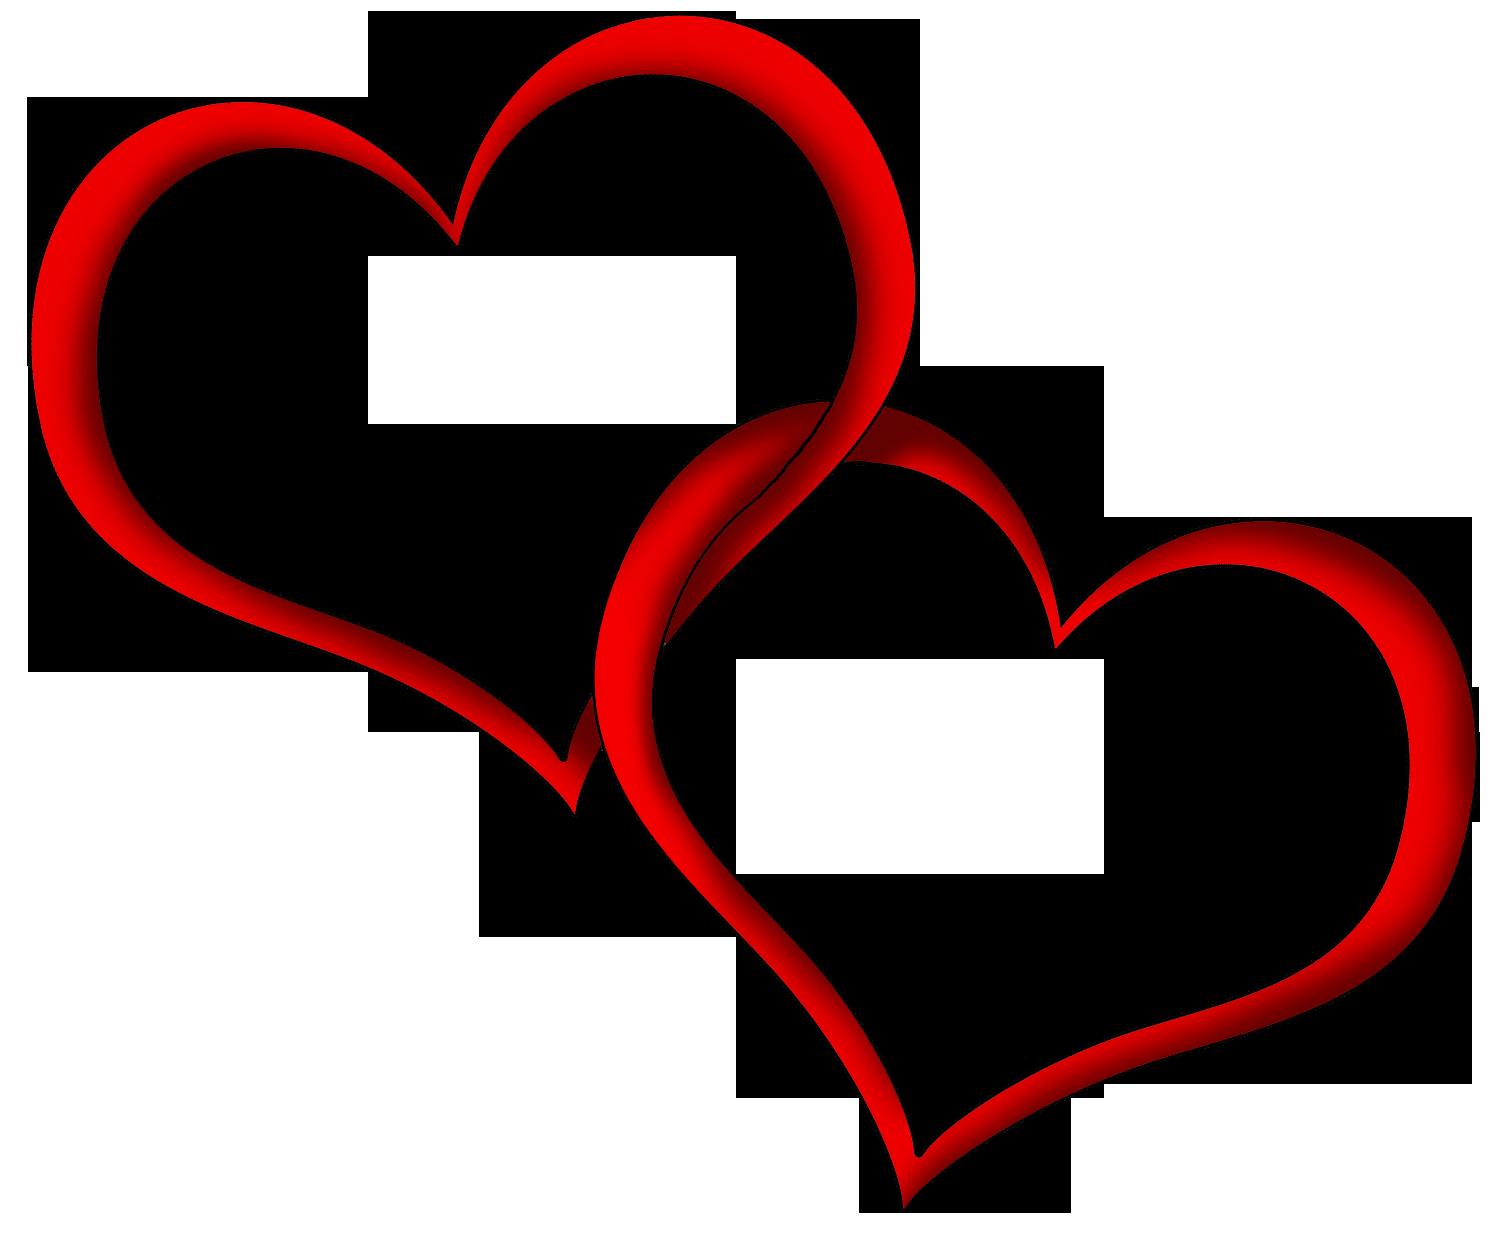 Red hearts clip art. Heart clipart tree